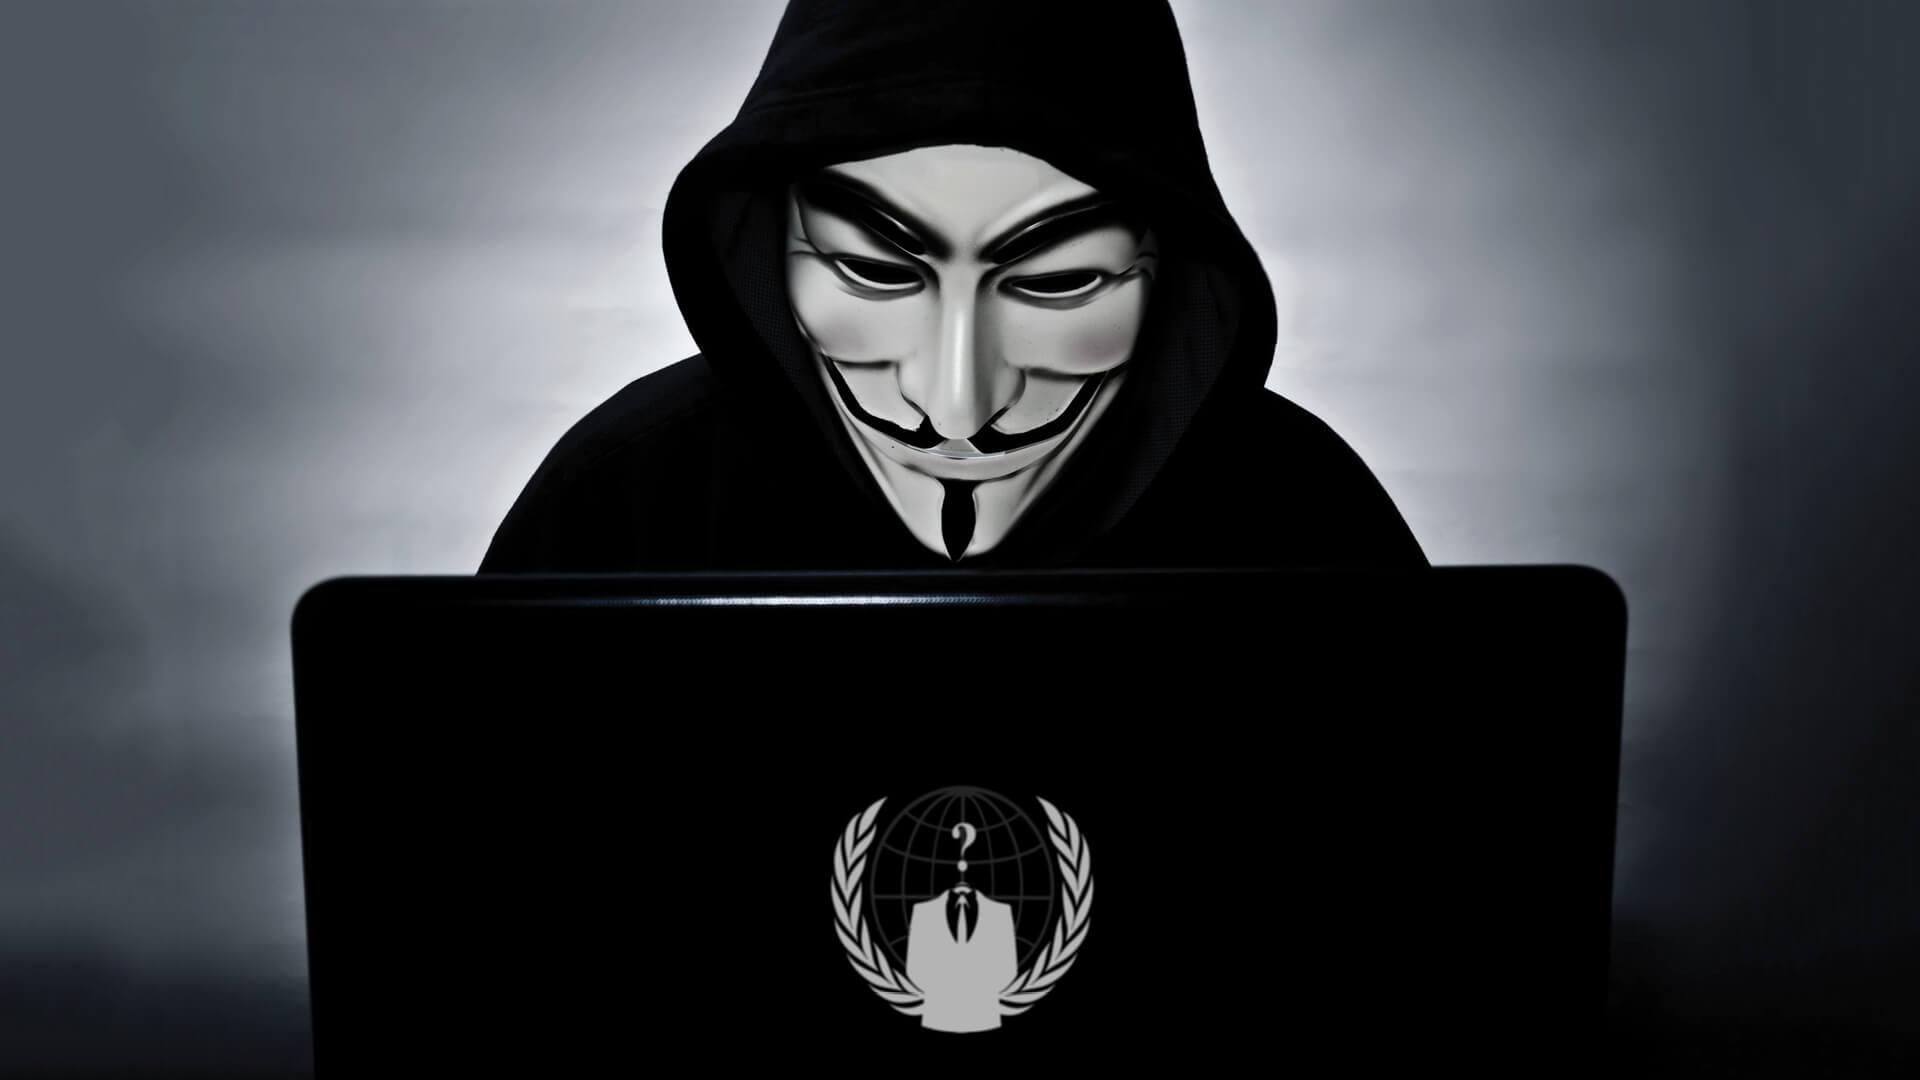 Julius Wiedemann discusses 'Hactivism' and online activism | Digital Legacies: Activism | STIRworld